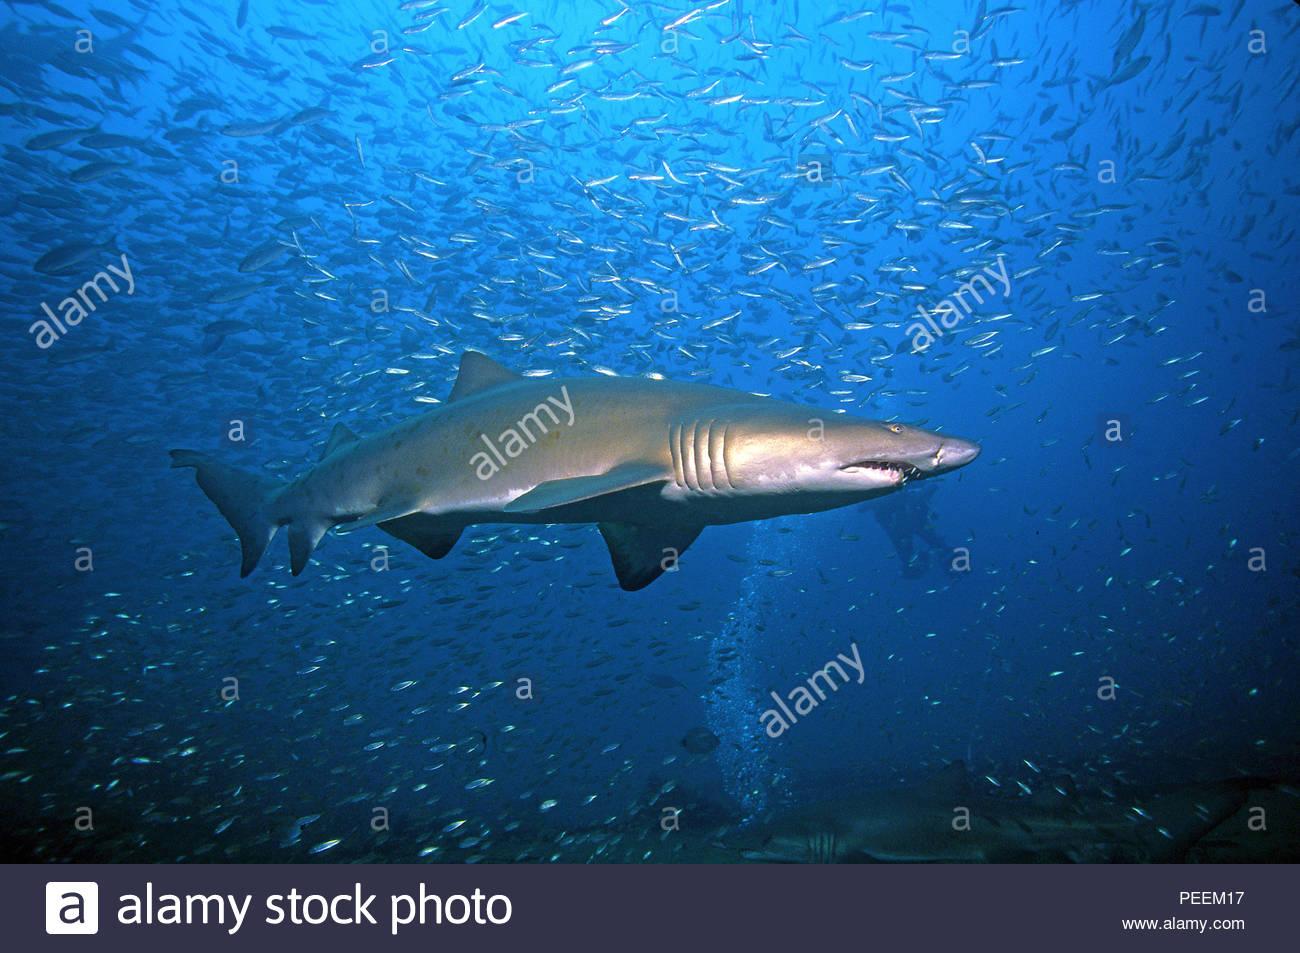 Sandtiger or Sand tiger shark (Carcharias taurus synonym Eugomphodus taurus) at a shooling fish, North Carolina, USA - Stock Image